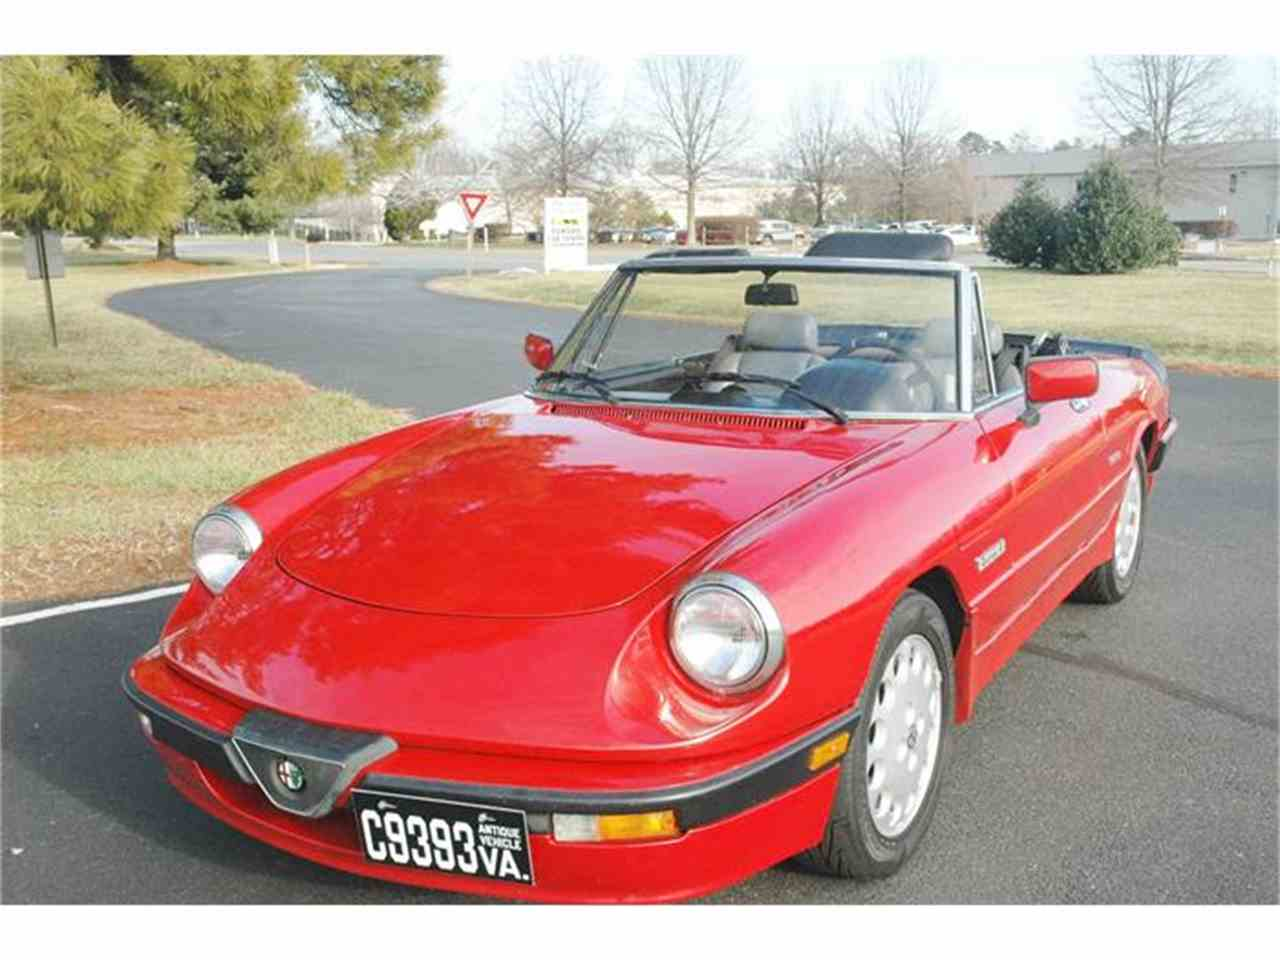 "Alfa Romeo - Spider 2.0 ""Quadrifoglio Verde"" - 1988 - Catawiki  |1988 Alfa Romeo Quadrifoglio"